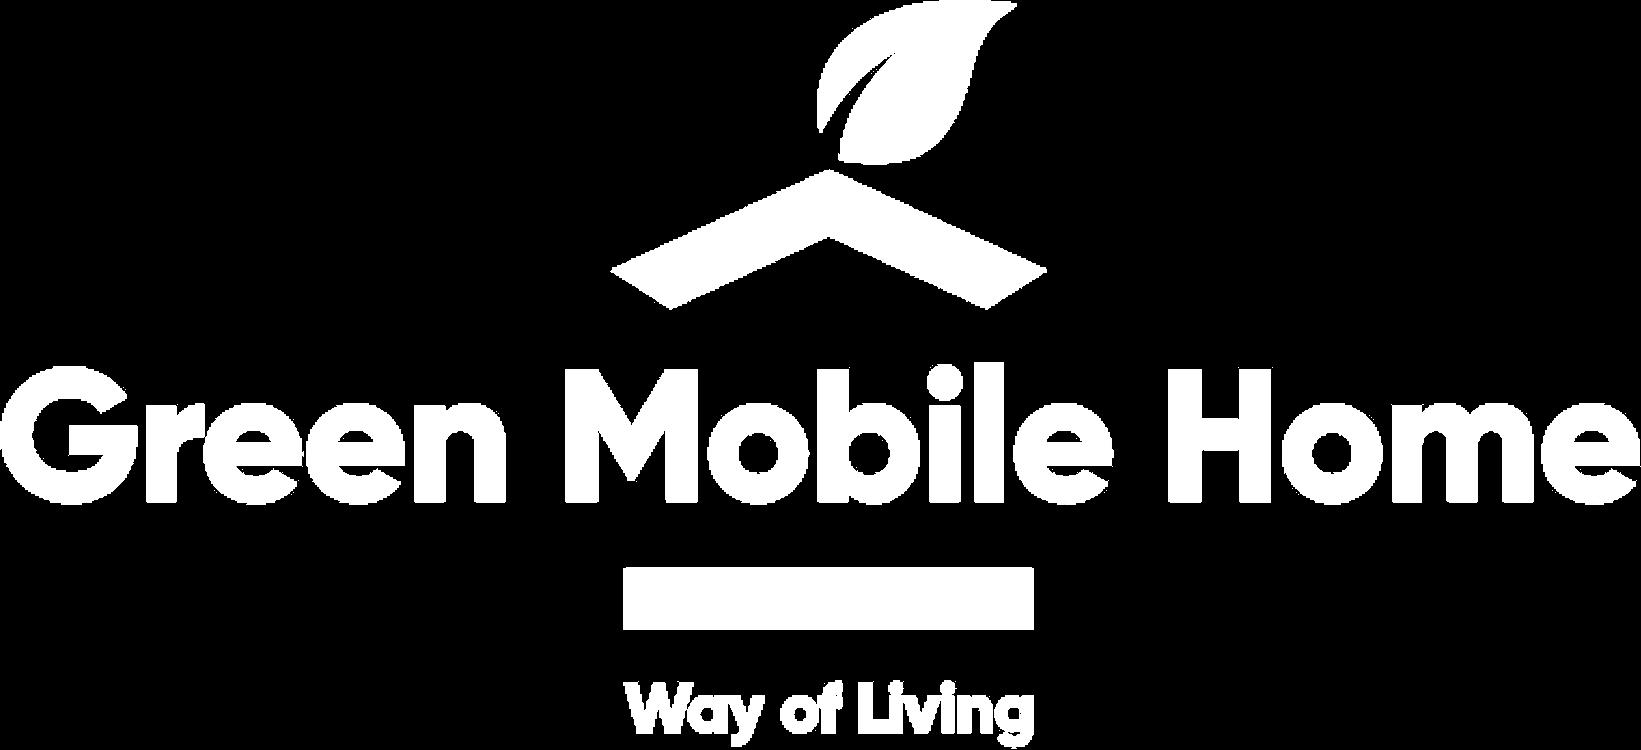 Green Mobile Home